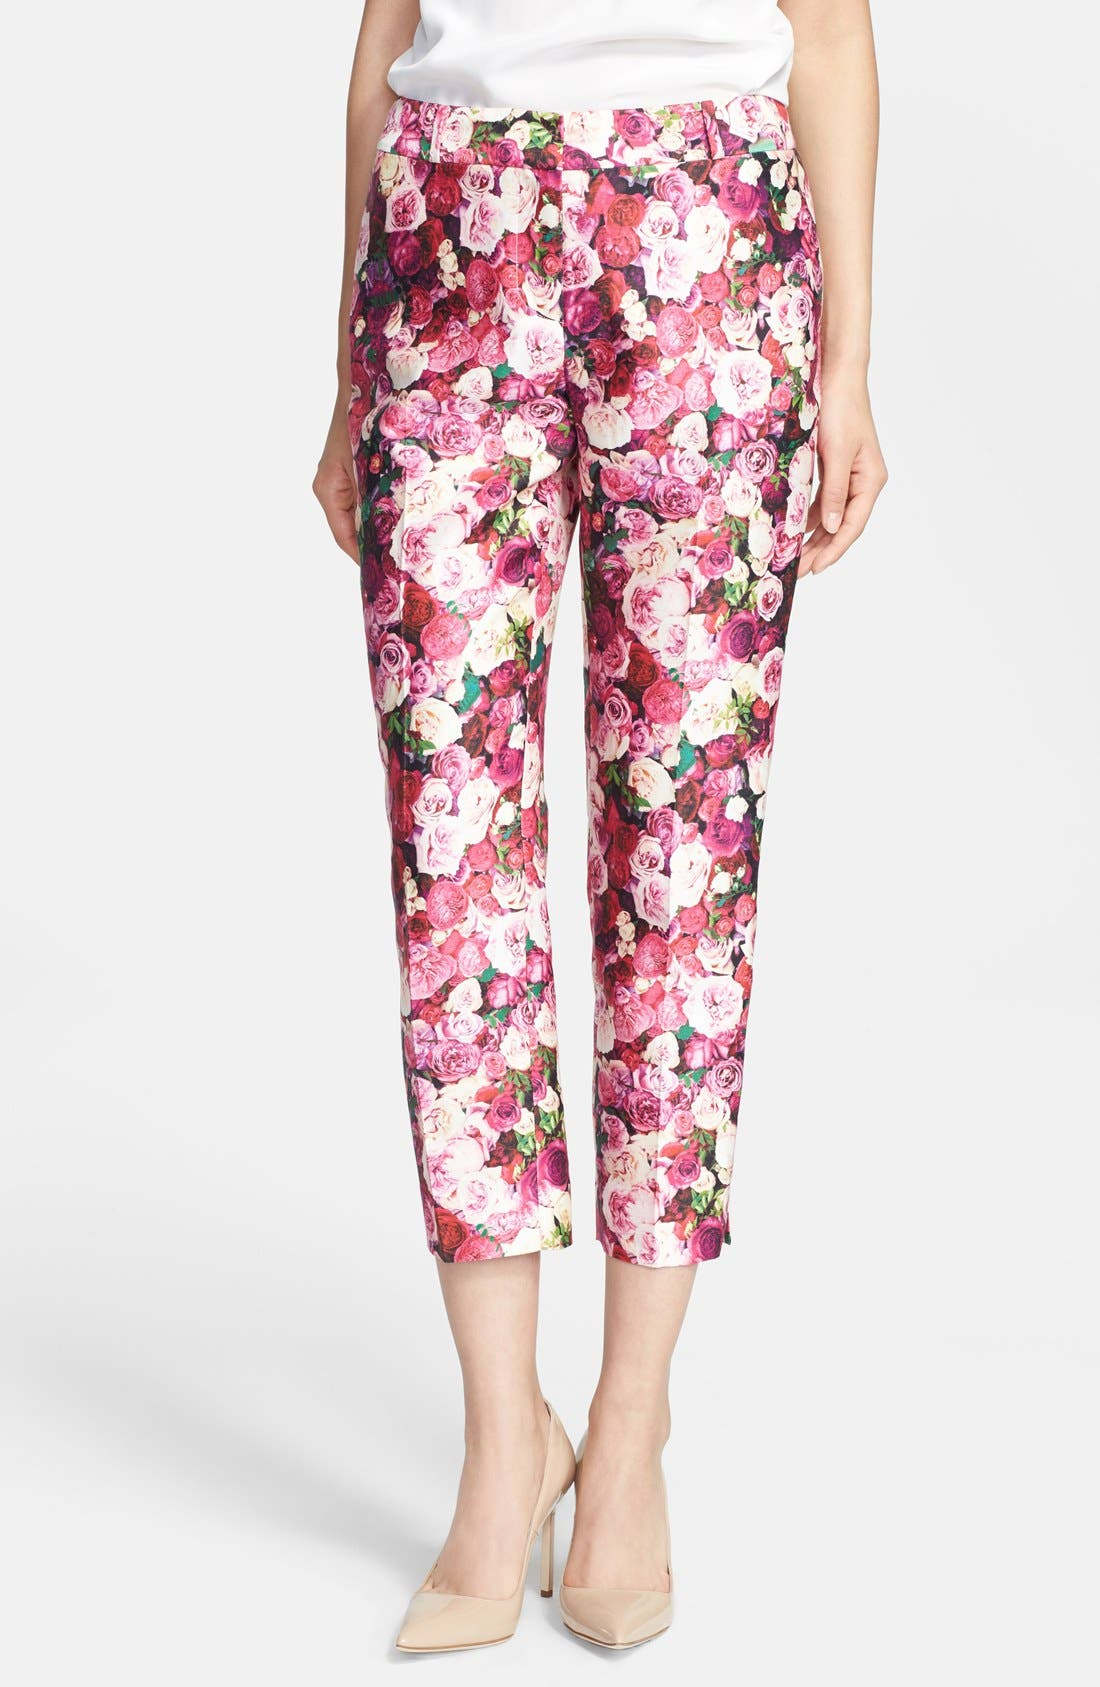 KATE SPADE NEW YORK,                             'jackie' rose print cotton & silk capri pants,                             Main thumbnail 1, color,                             655